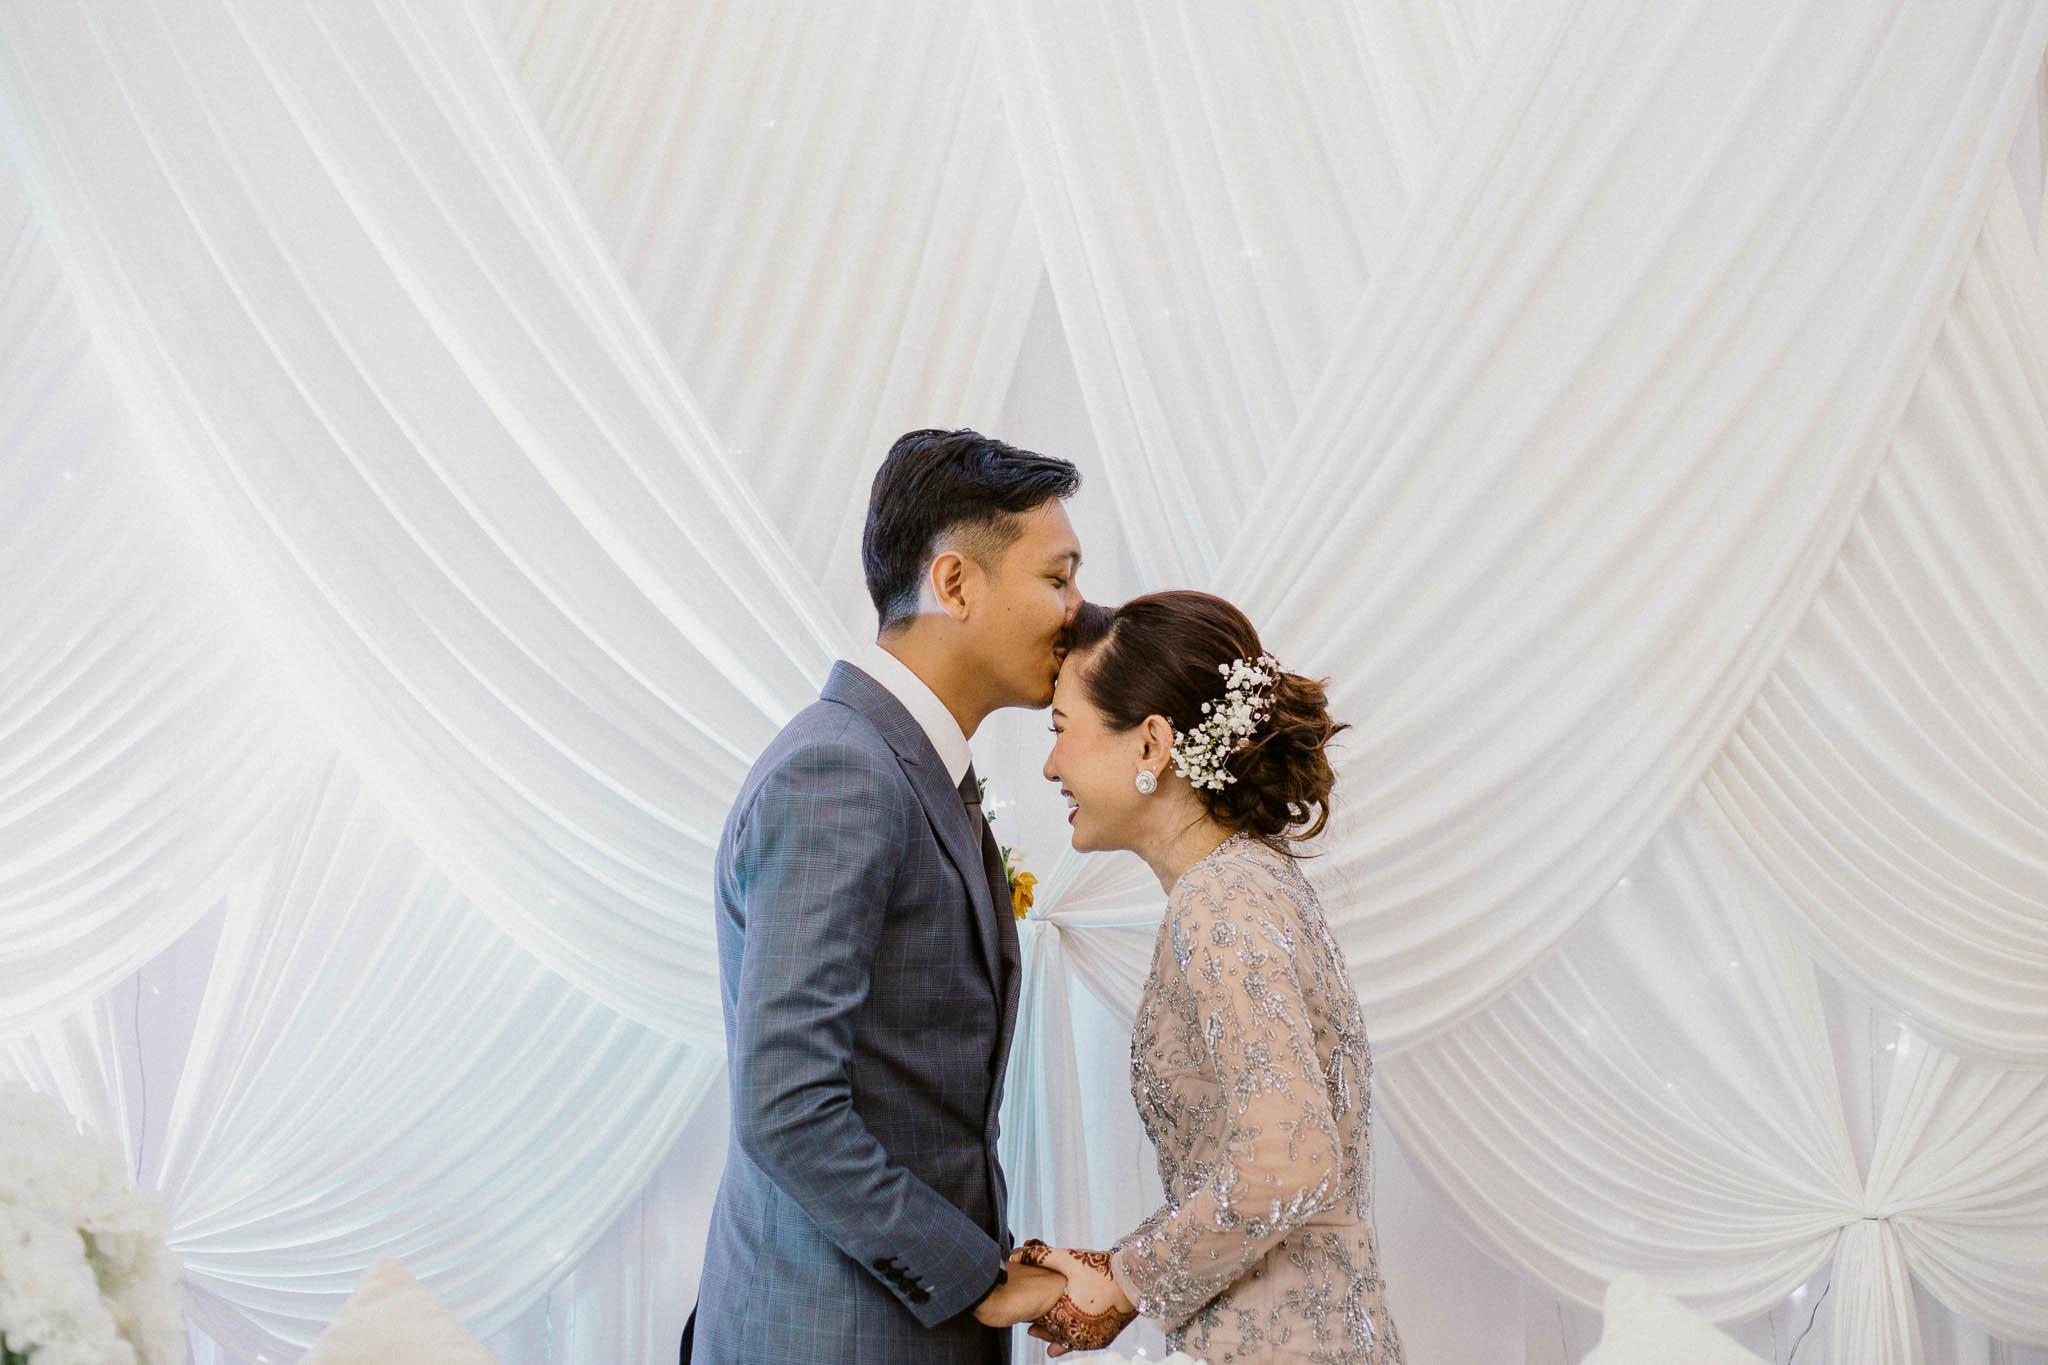 singapore-wedding-photographer-addafiq-nufail-065.jpg